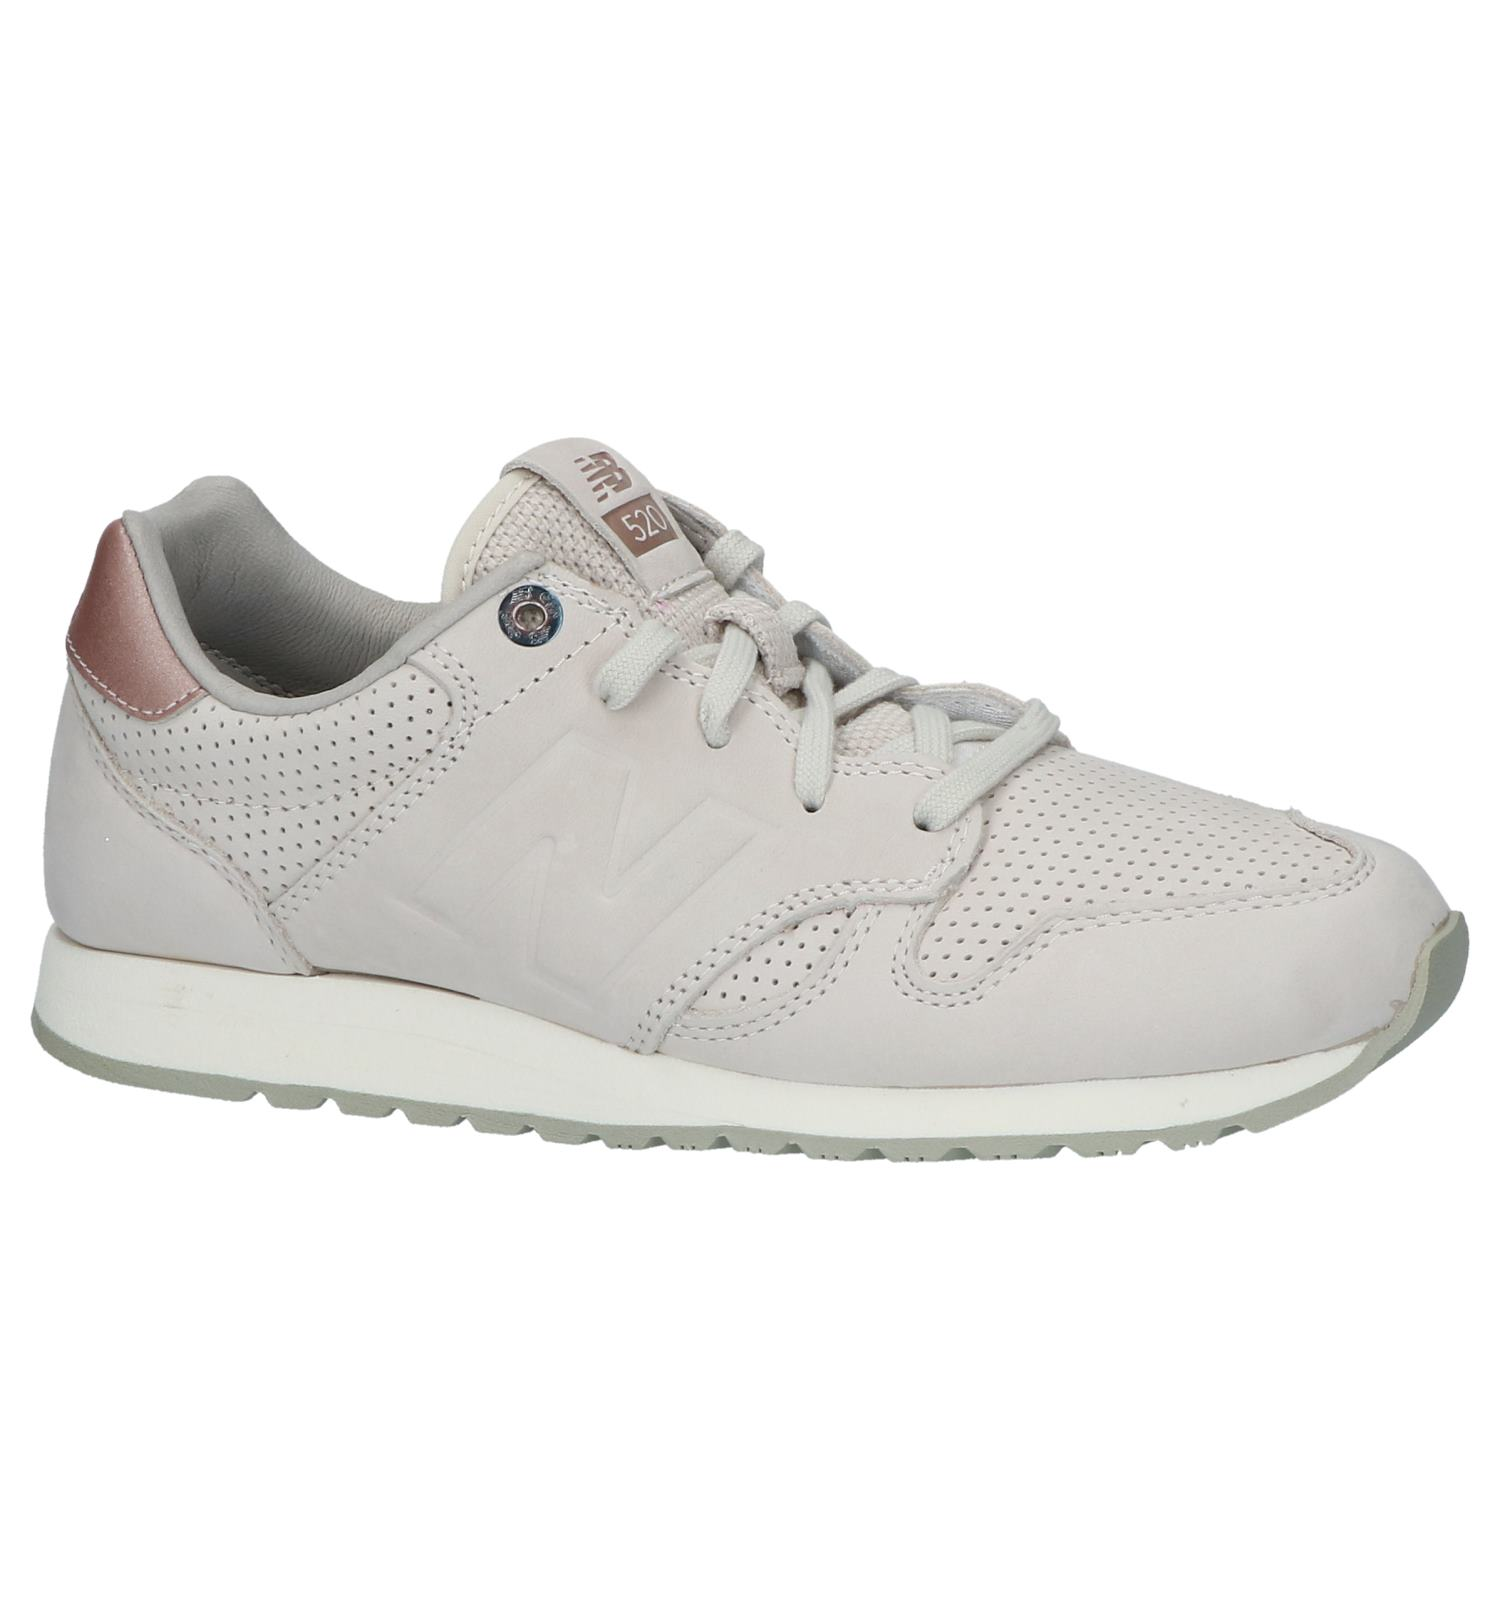 28332627840 Beige Lage Sportieve Sneakers New Balance | TORFS.BE | Gratis verzend en  retour